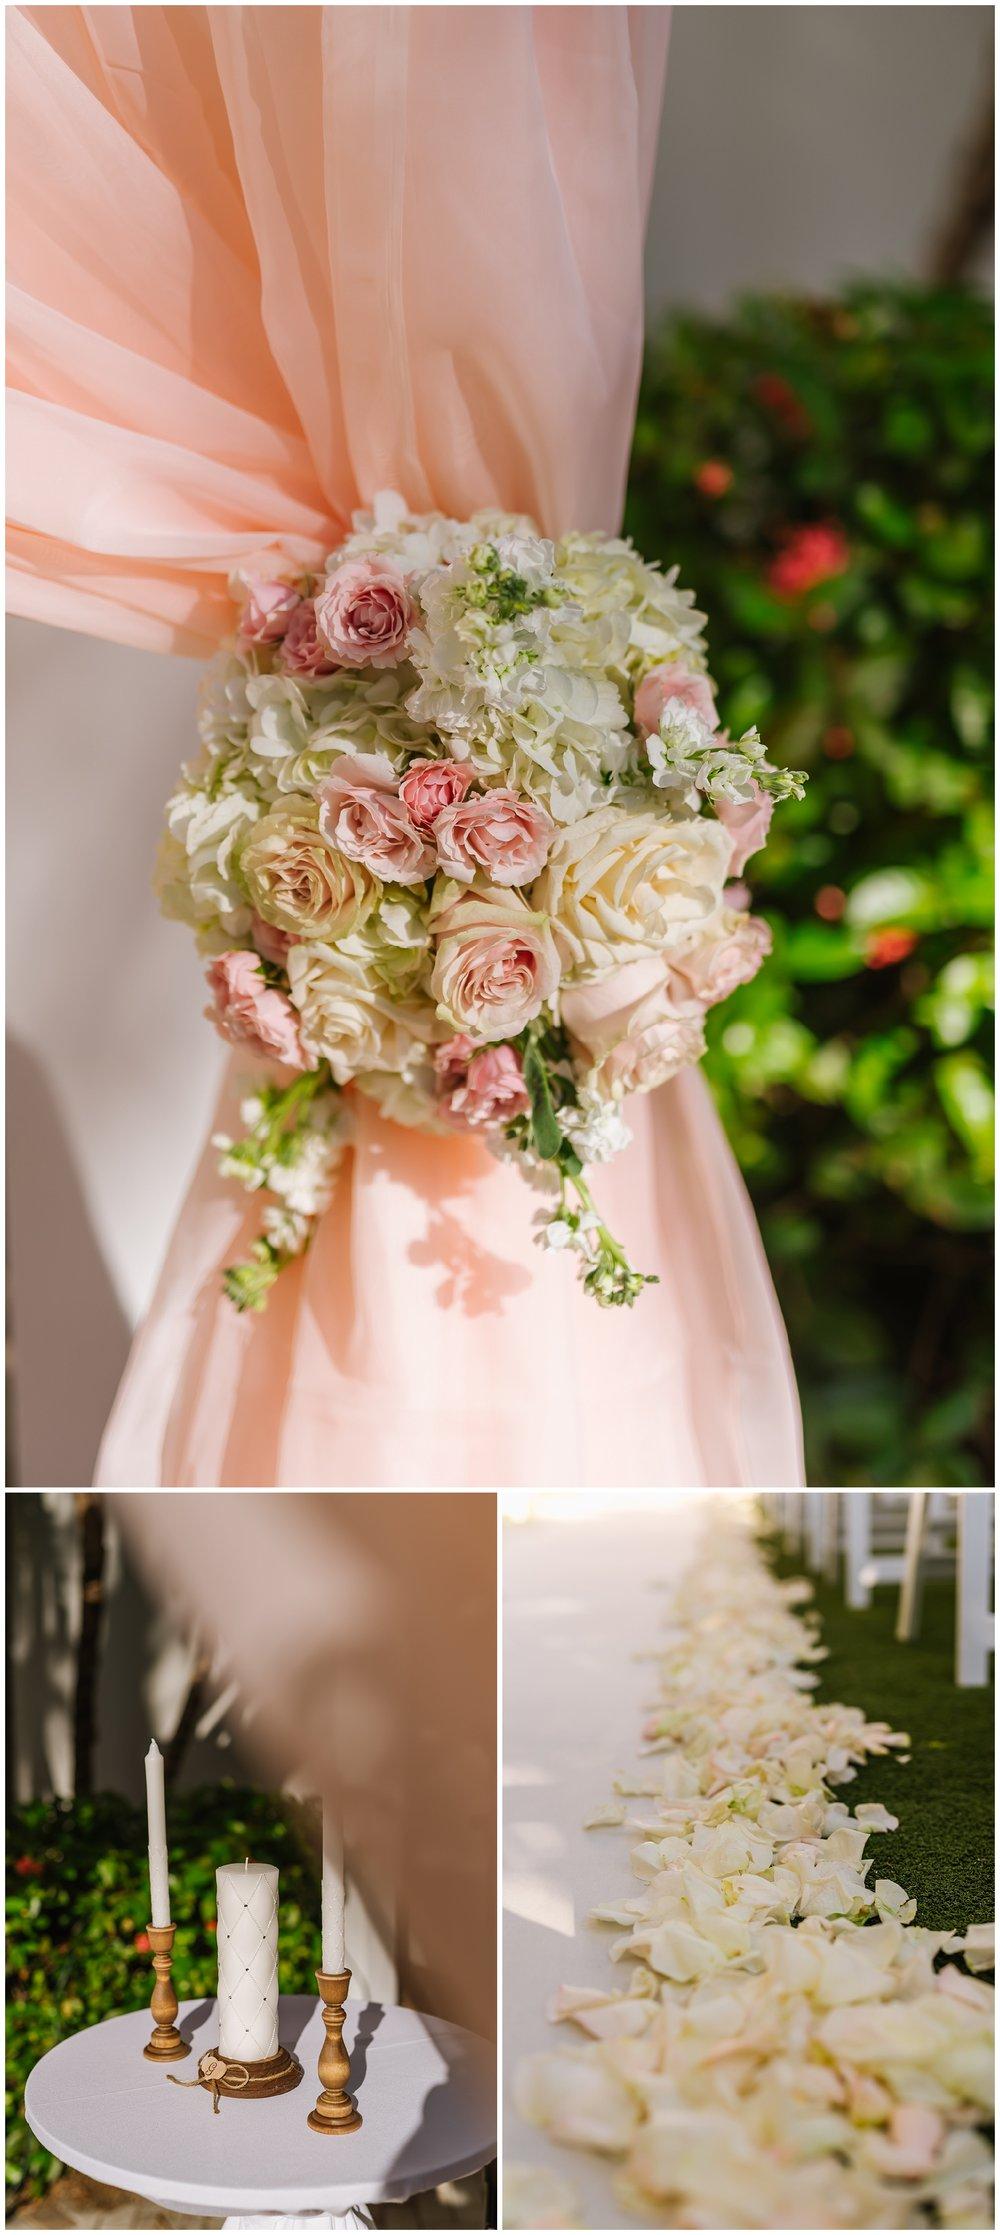 Sarasota-wedding-photographer-hyatt-regency-blush_0031.jpg